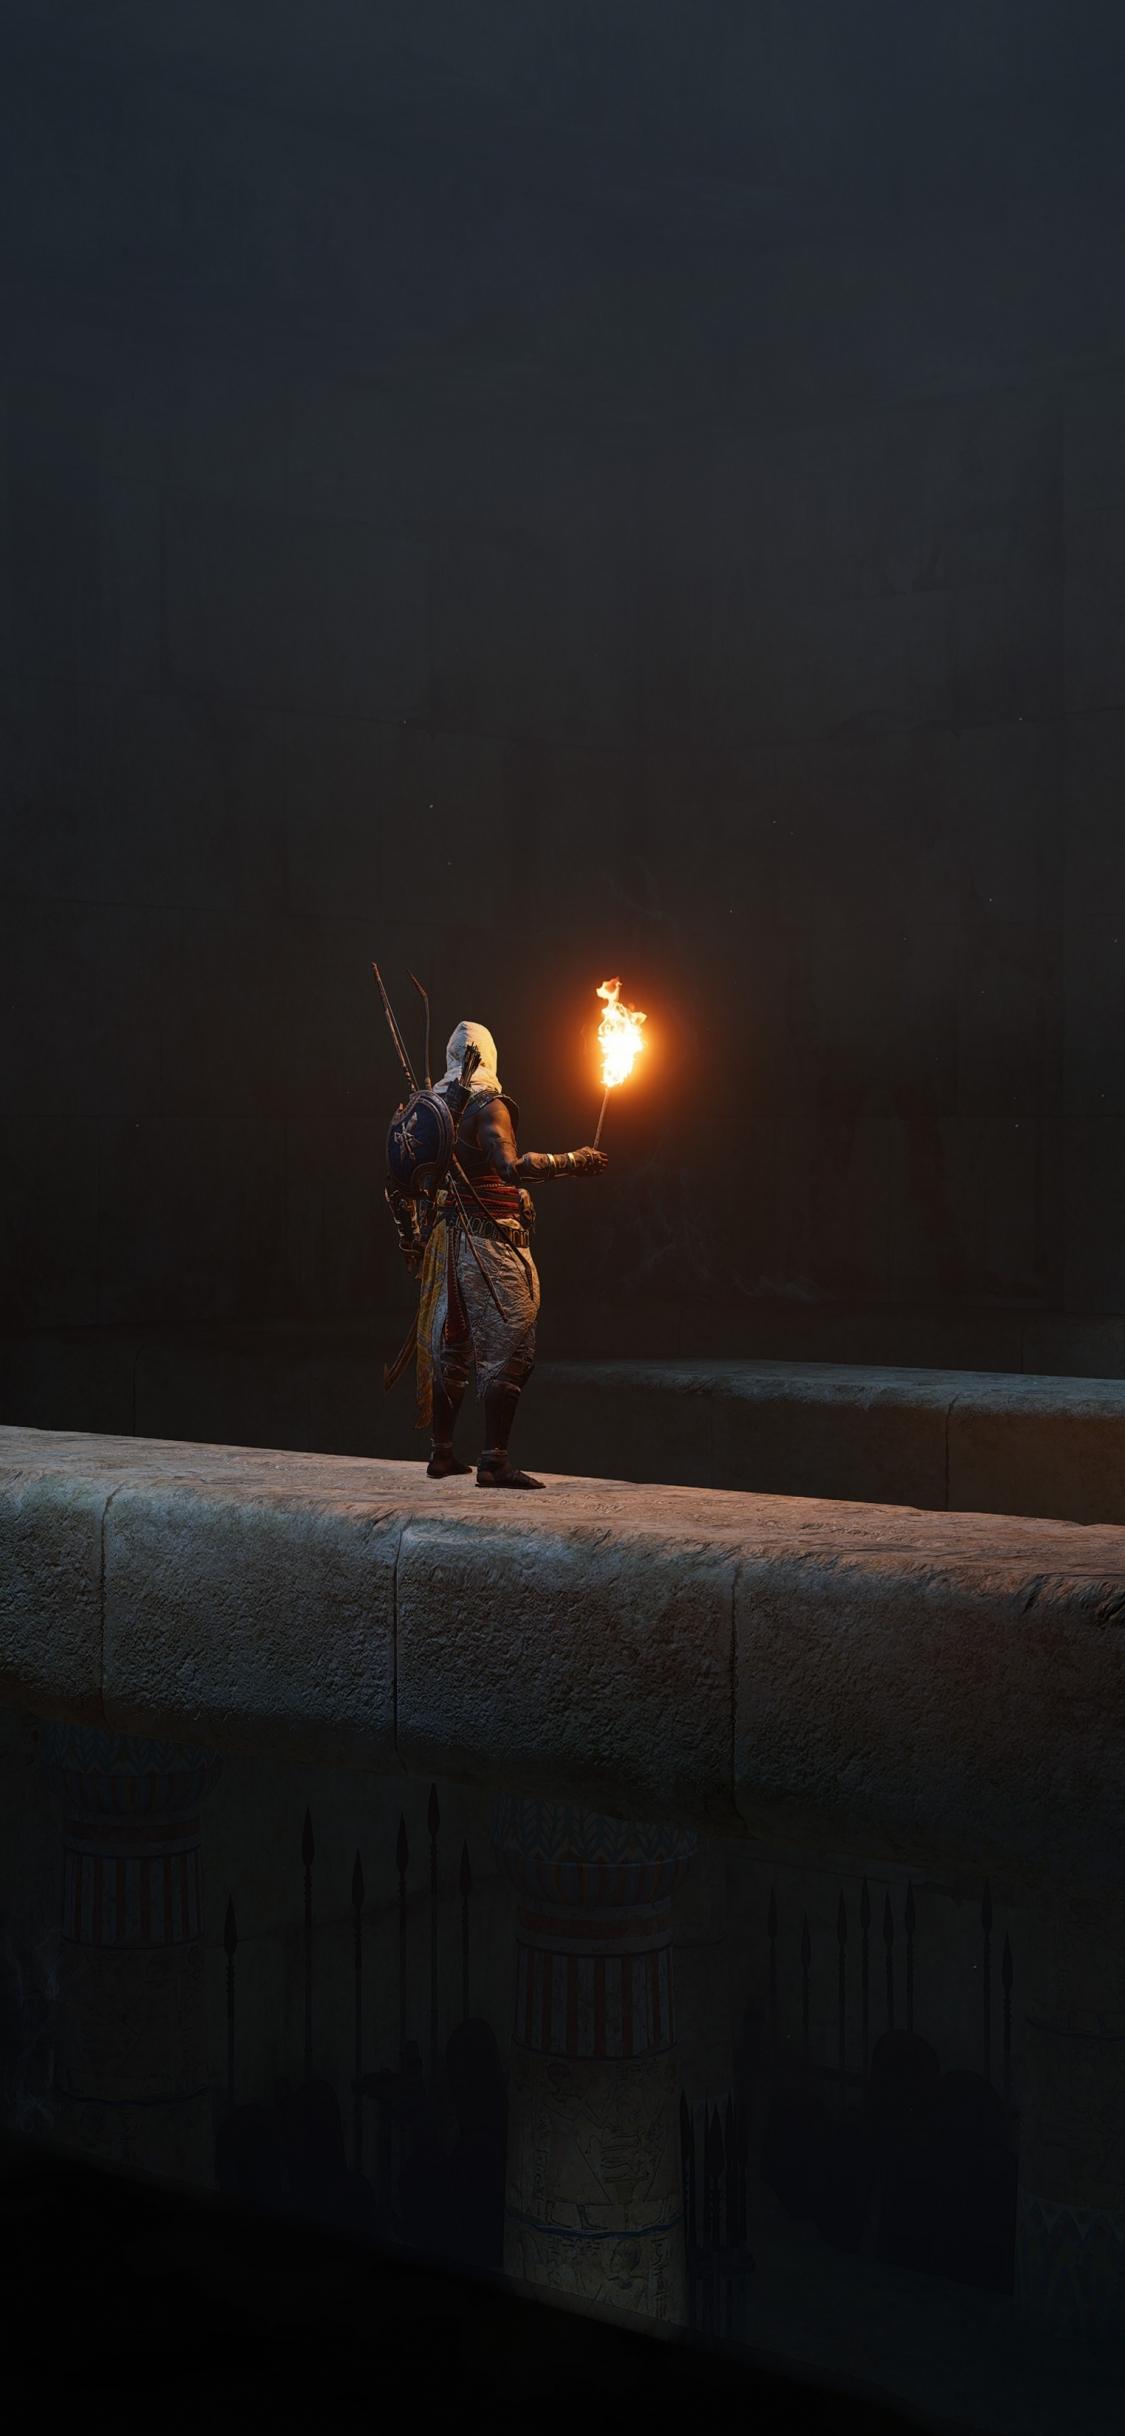 Download 1125x2436 Wallpaper Dark Assassin S Creed Origins Video